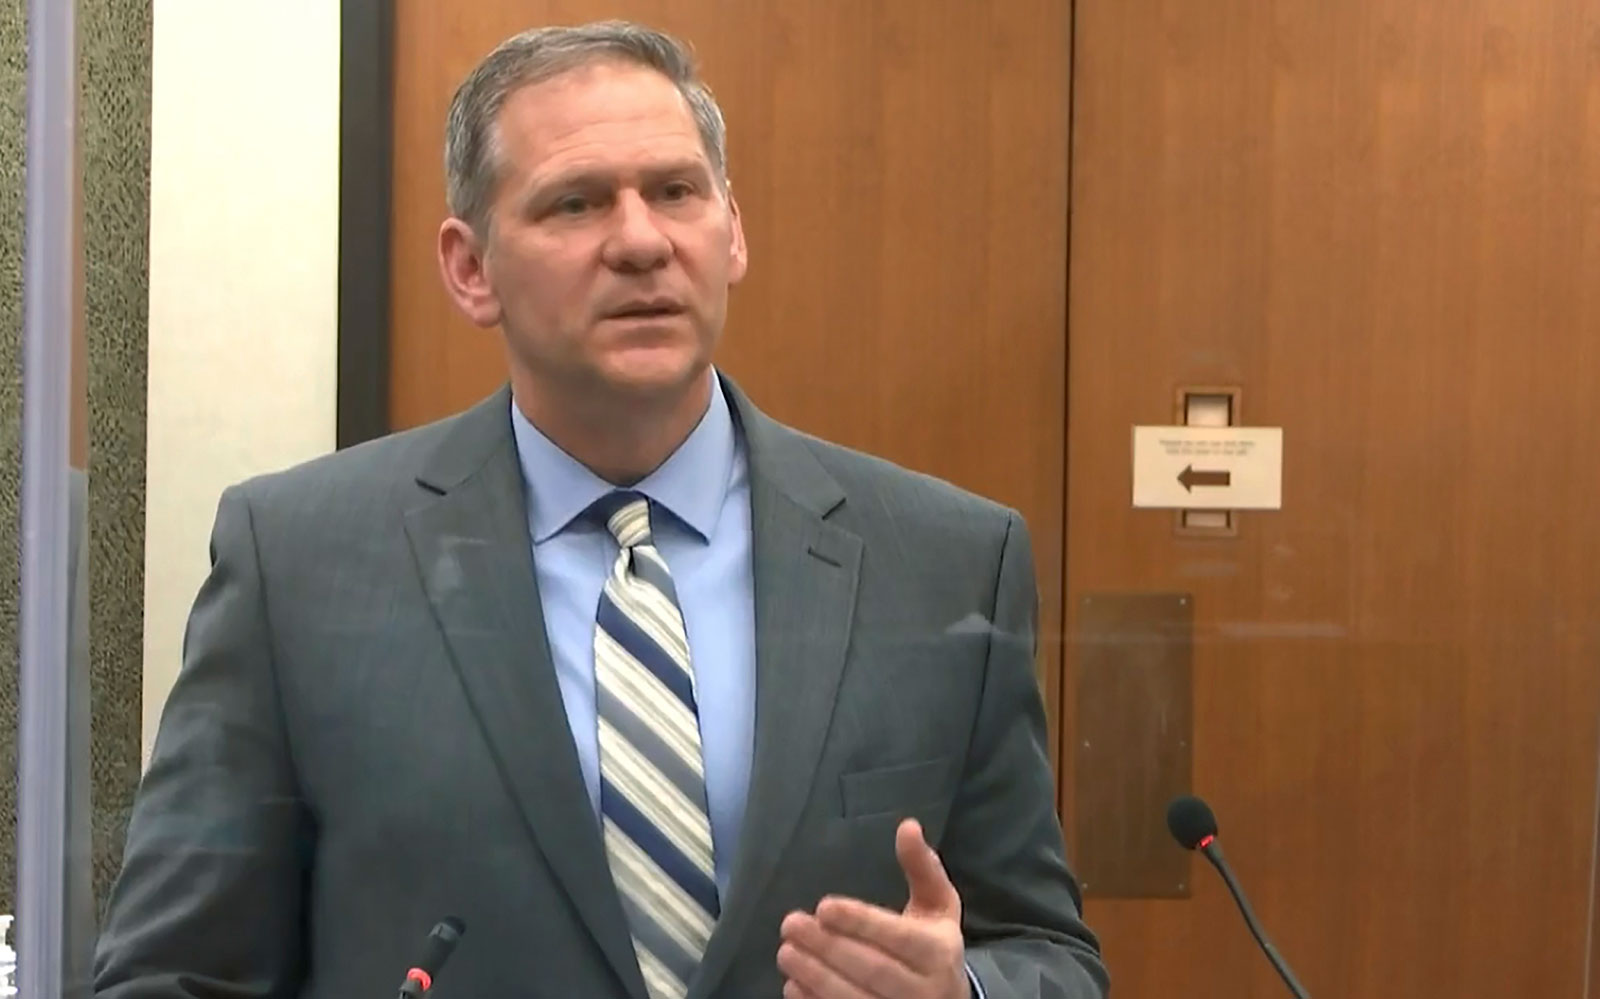 Prosecutor Steve Schleicher speaks during court proceedings on Monday, April 12.